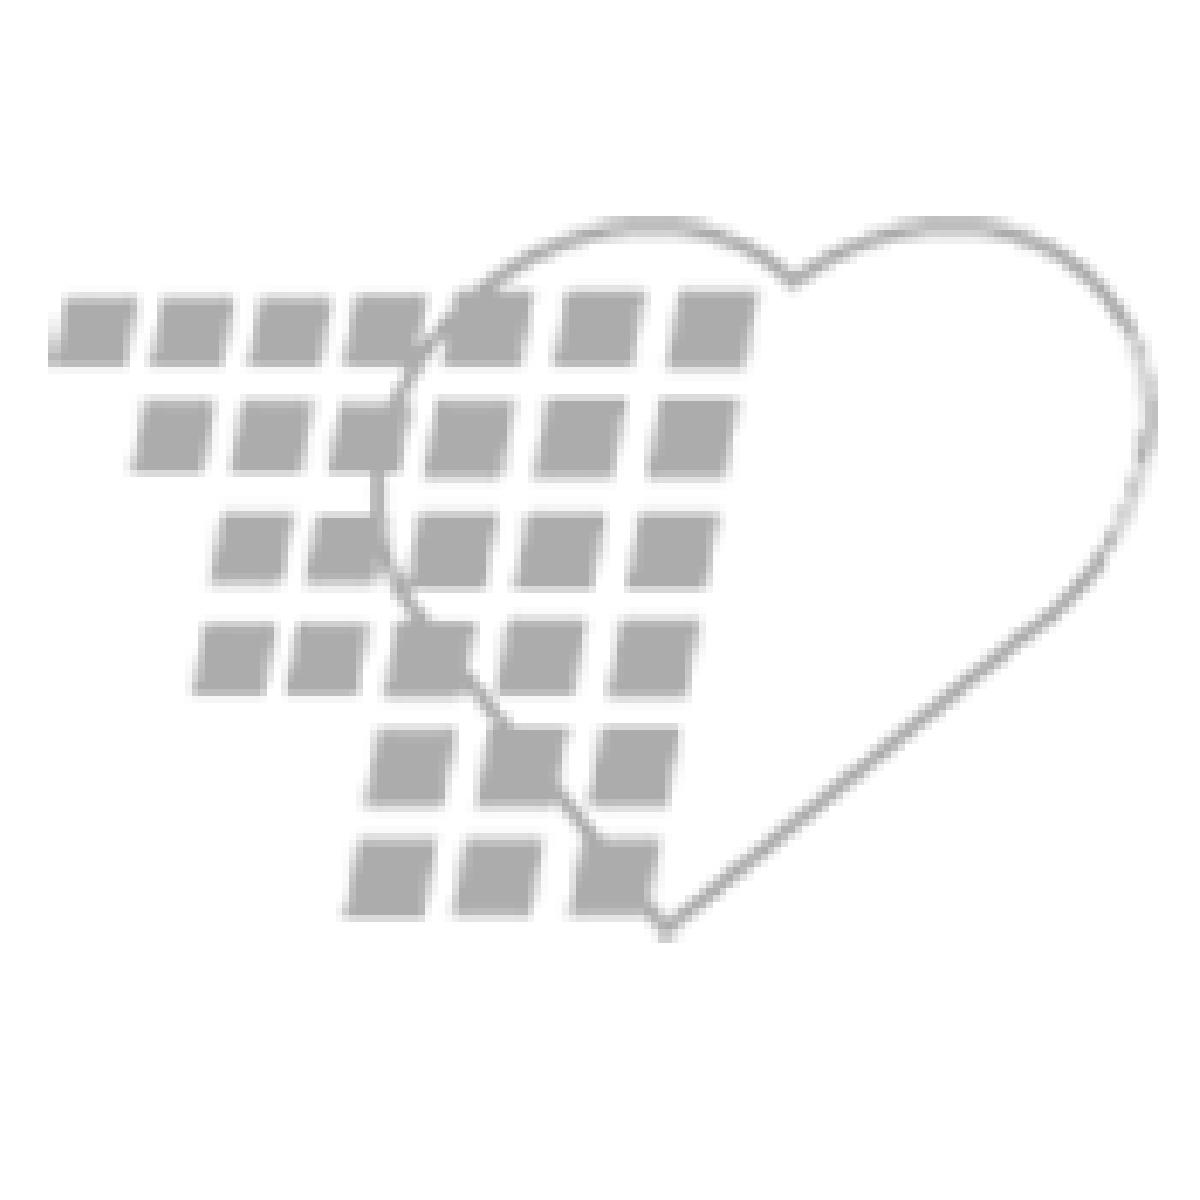 02-70-1124 - Diagnostix   Pocket Ophthalmoscope